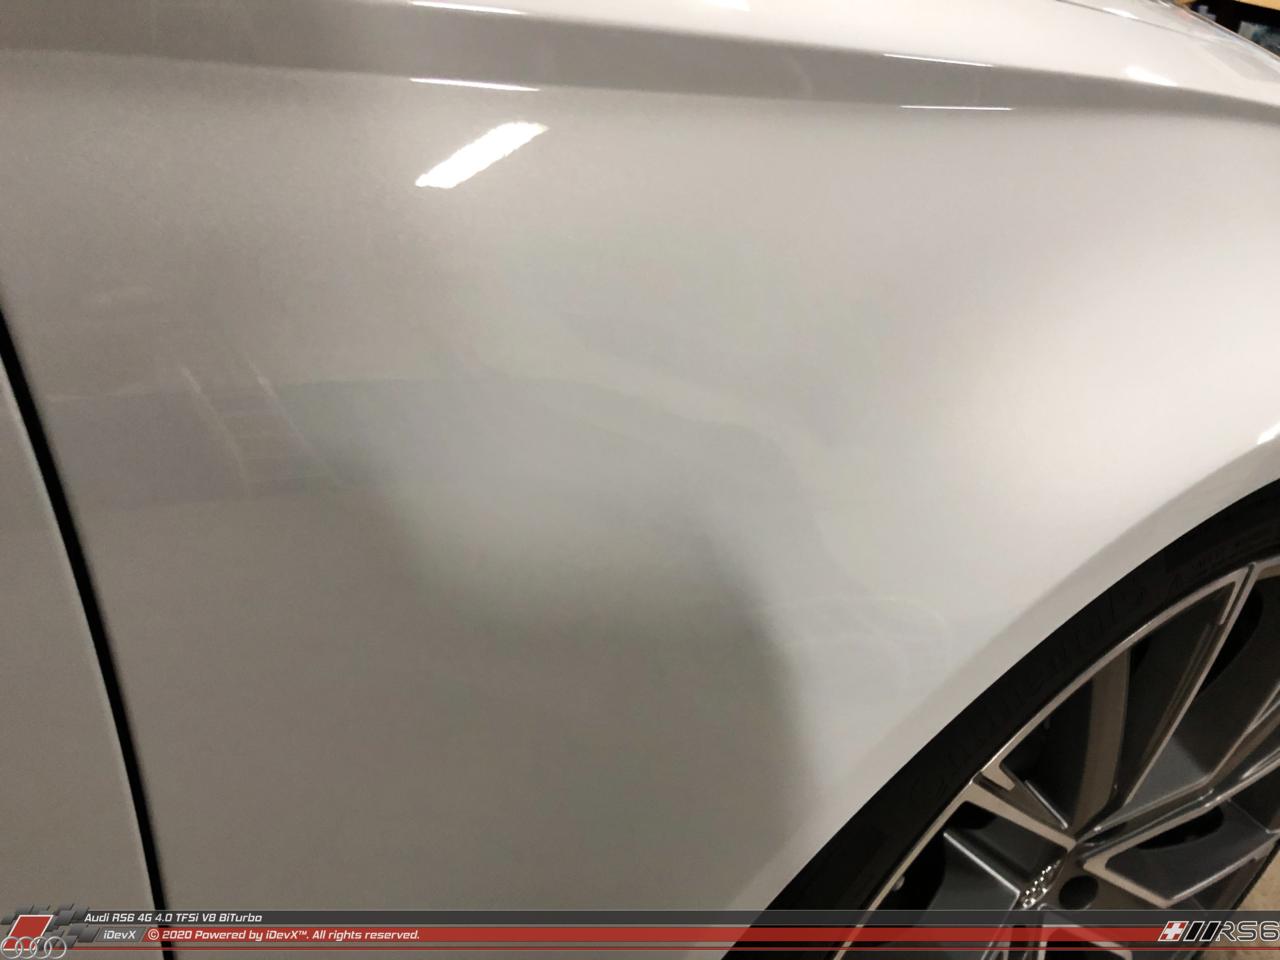 05_08.2019_Audi-RS6_iDevX_036b.png